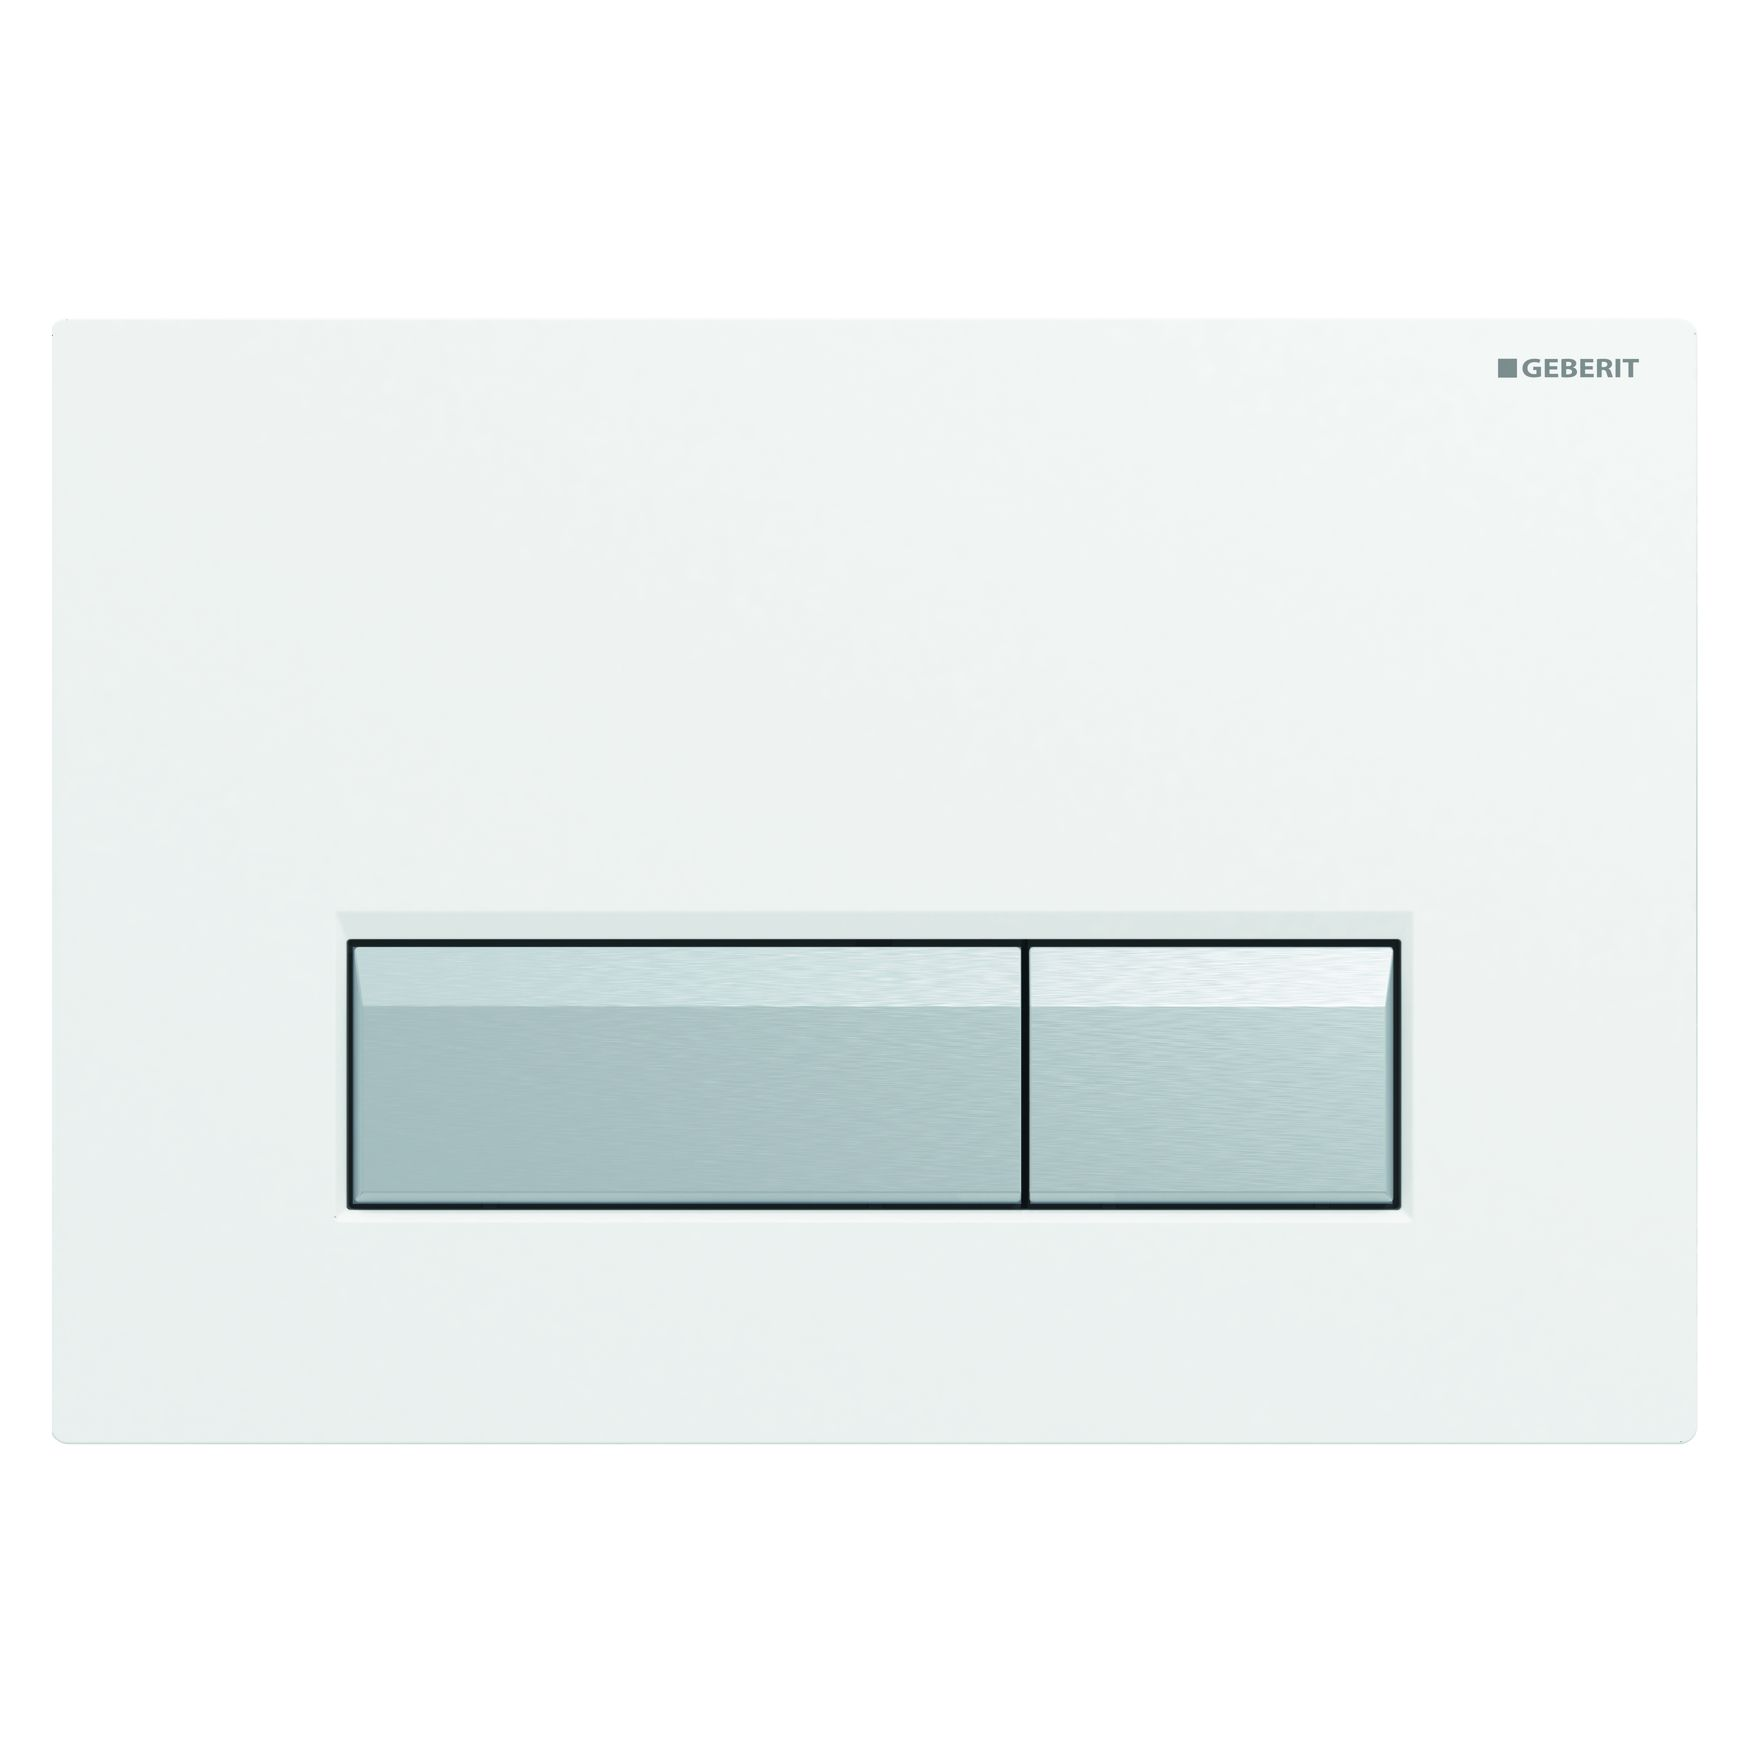 geberit plaque de commande sigma 40 pour b ti support duofresh verre blanc distriartisan. Black Bedroom Furniture Sets. Home Design Ideas